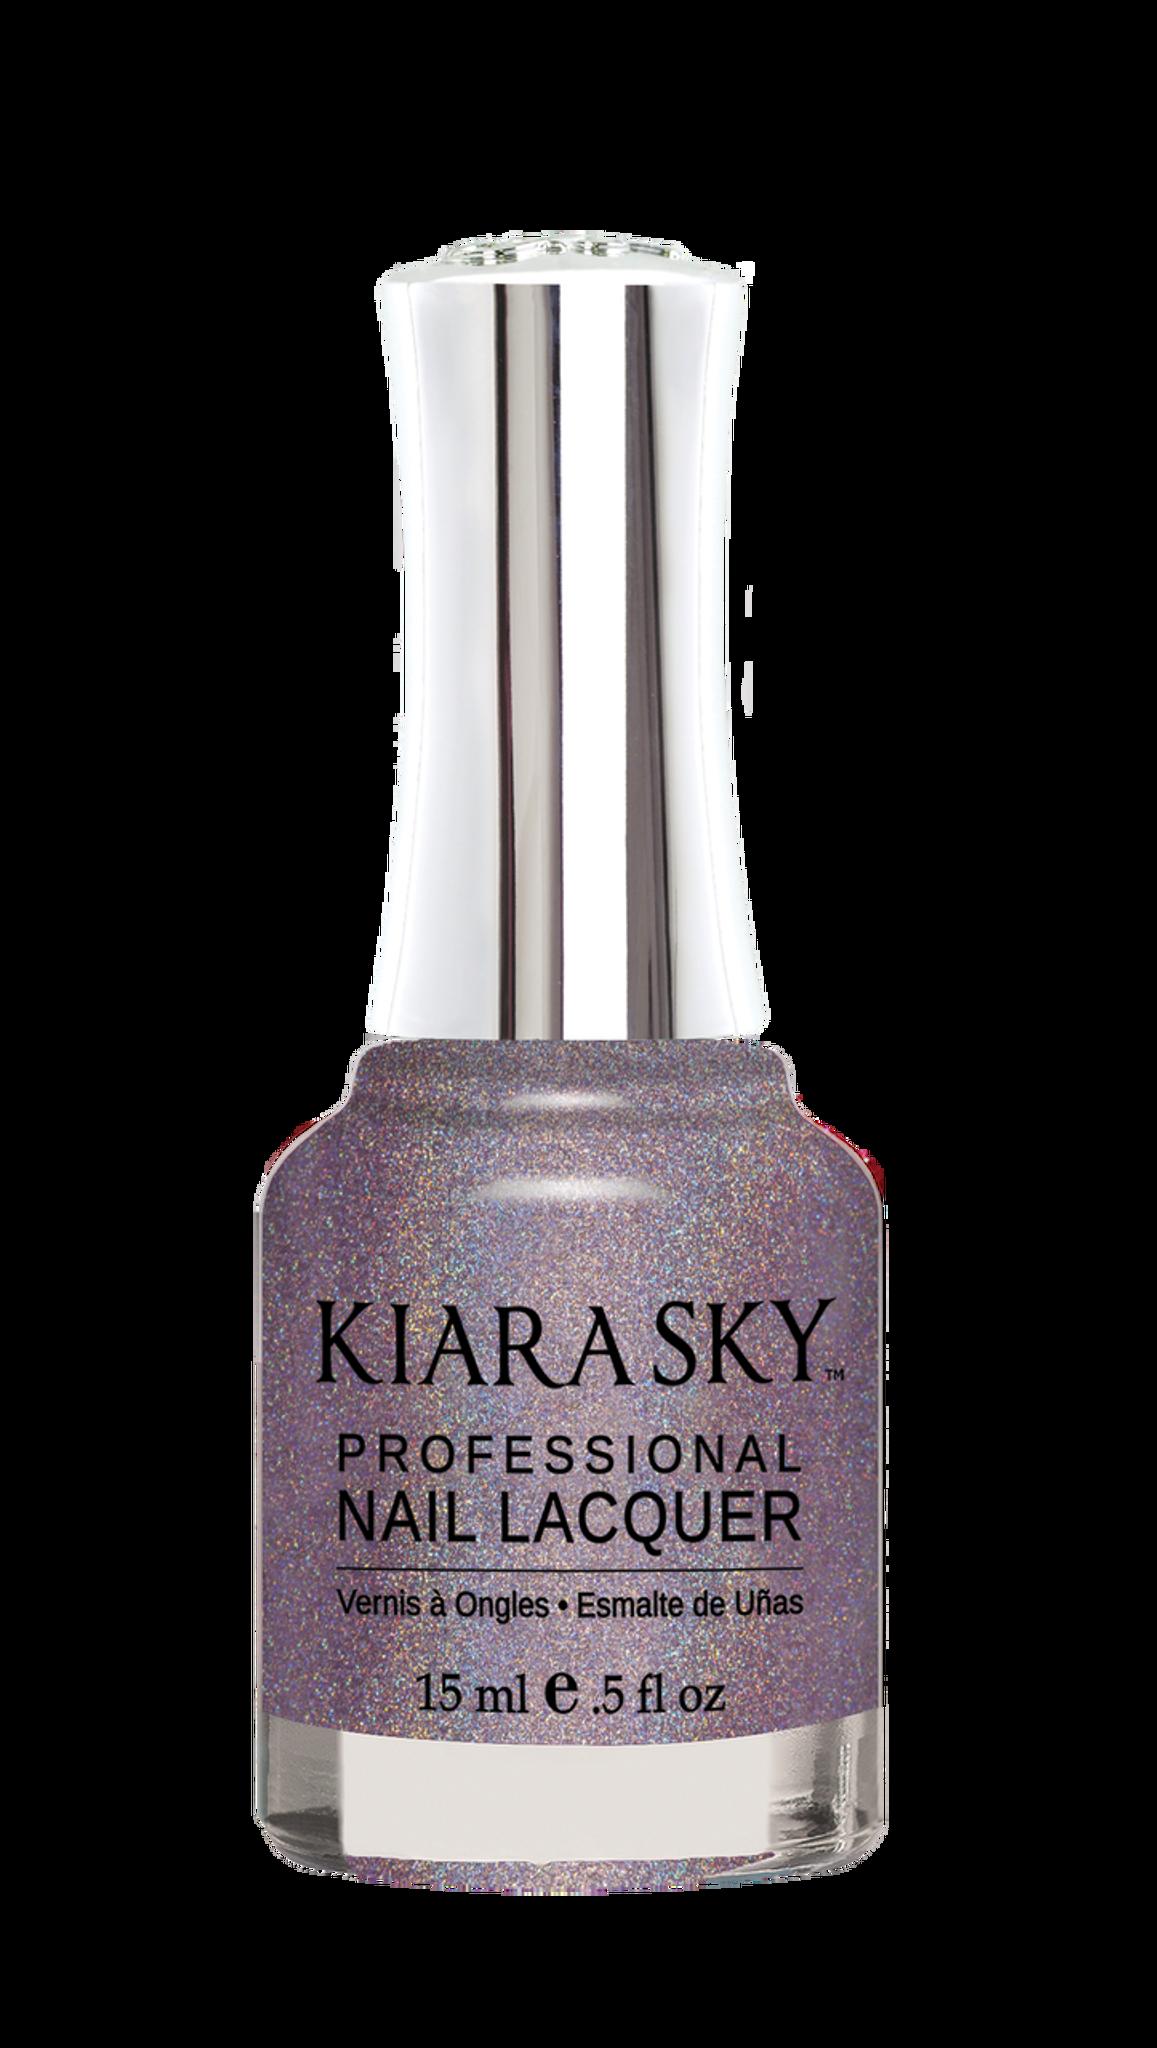 NAIL LACQUER - N902 MOTHER OF PEARL - Kiara Sky Professional Nails